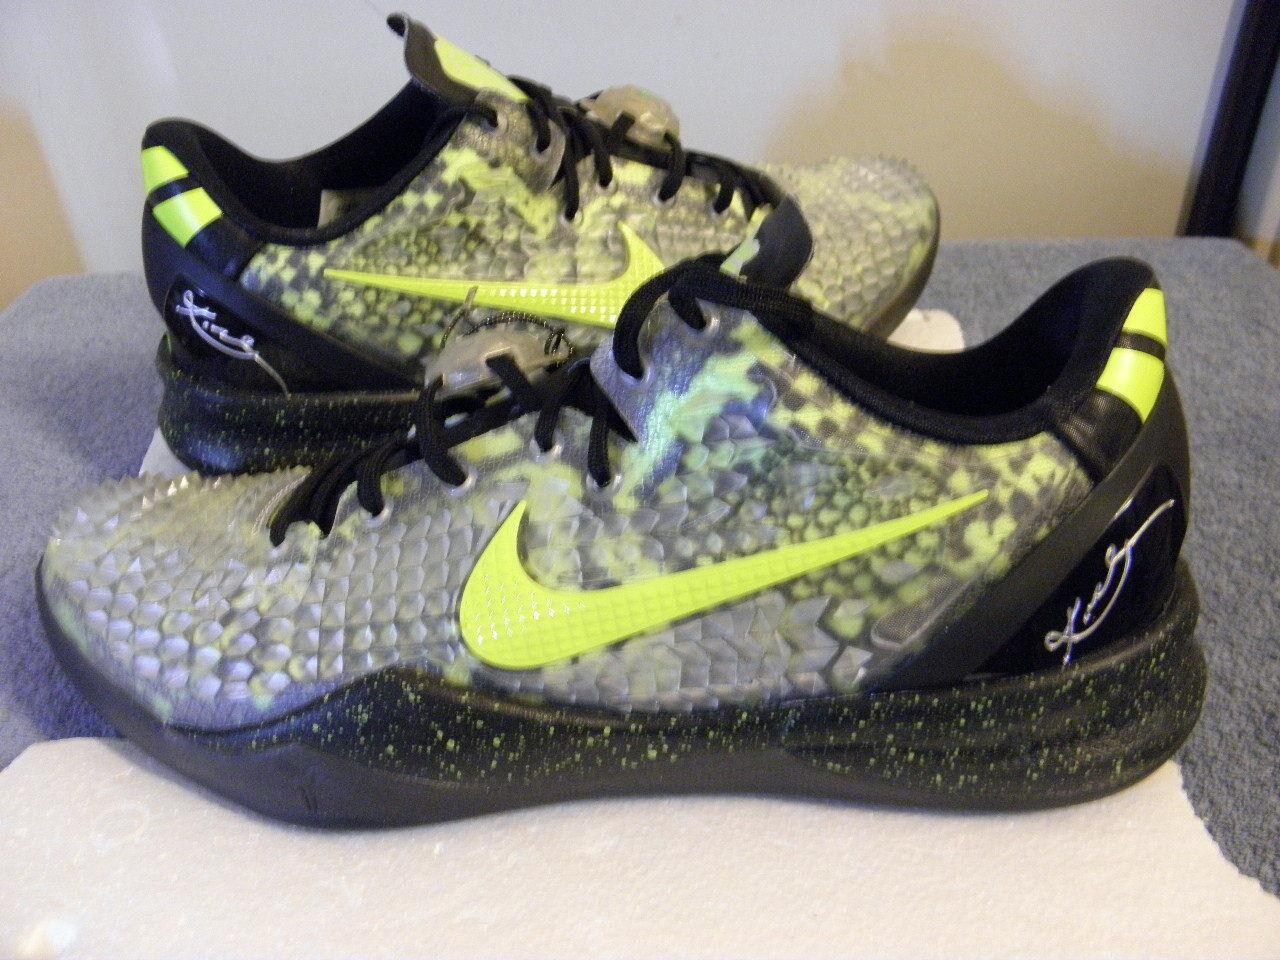 Nike derramar Air Zoom Kobe 8 VIII Bryant ID personalizados derramar Nike Piel De Serpiente 11.5 VNDS Nikeid 4f6949